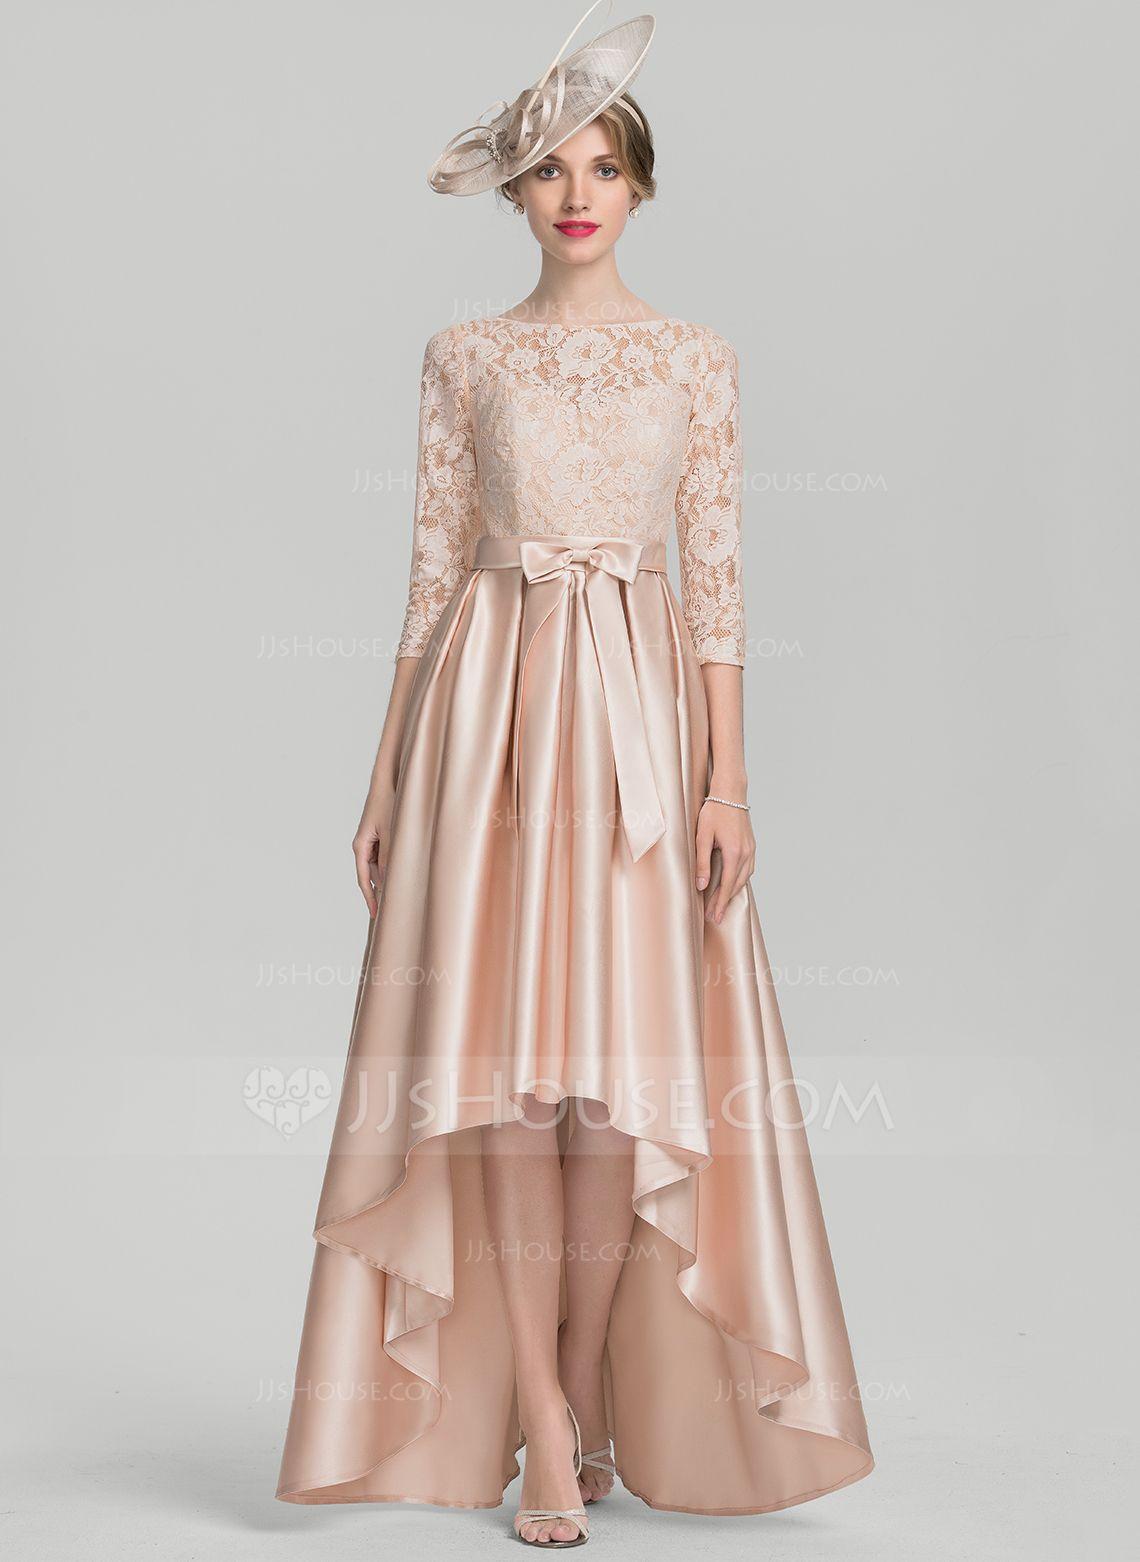 Wedding dress shops in deira dubai  Sparkling Tulle Cami Dress in Pink  dress collection  Pinterest